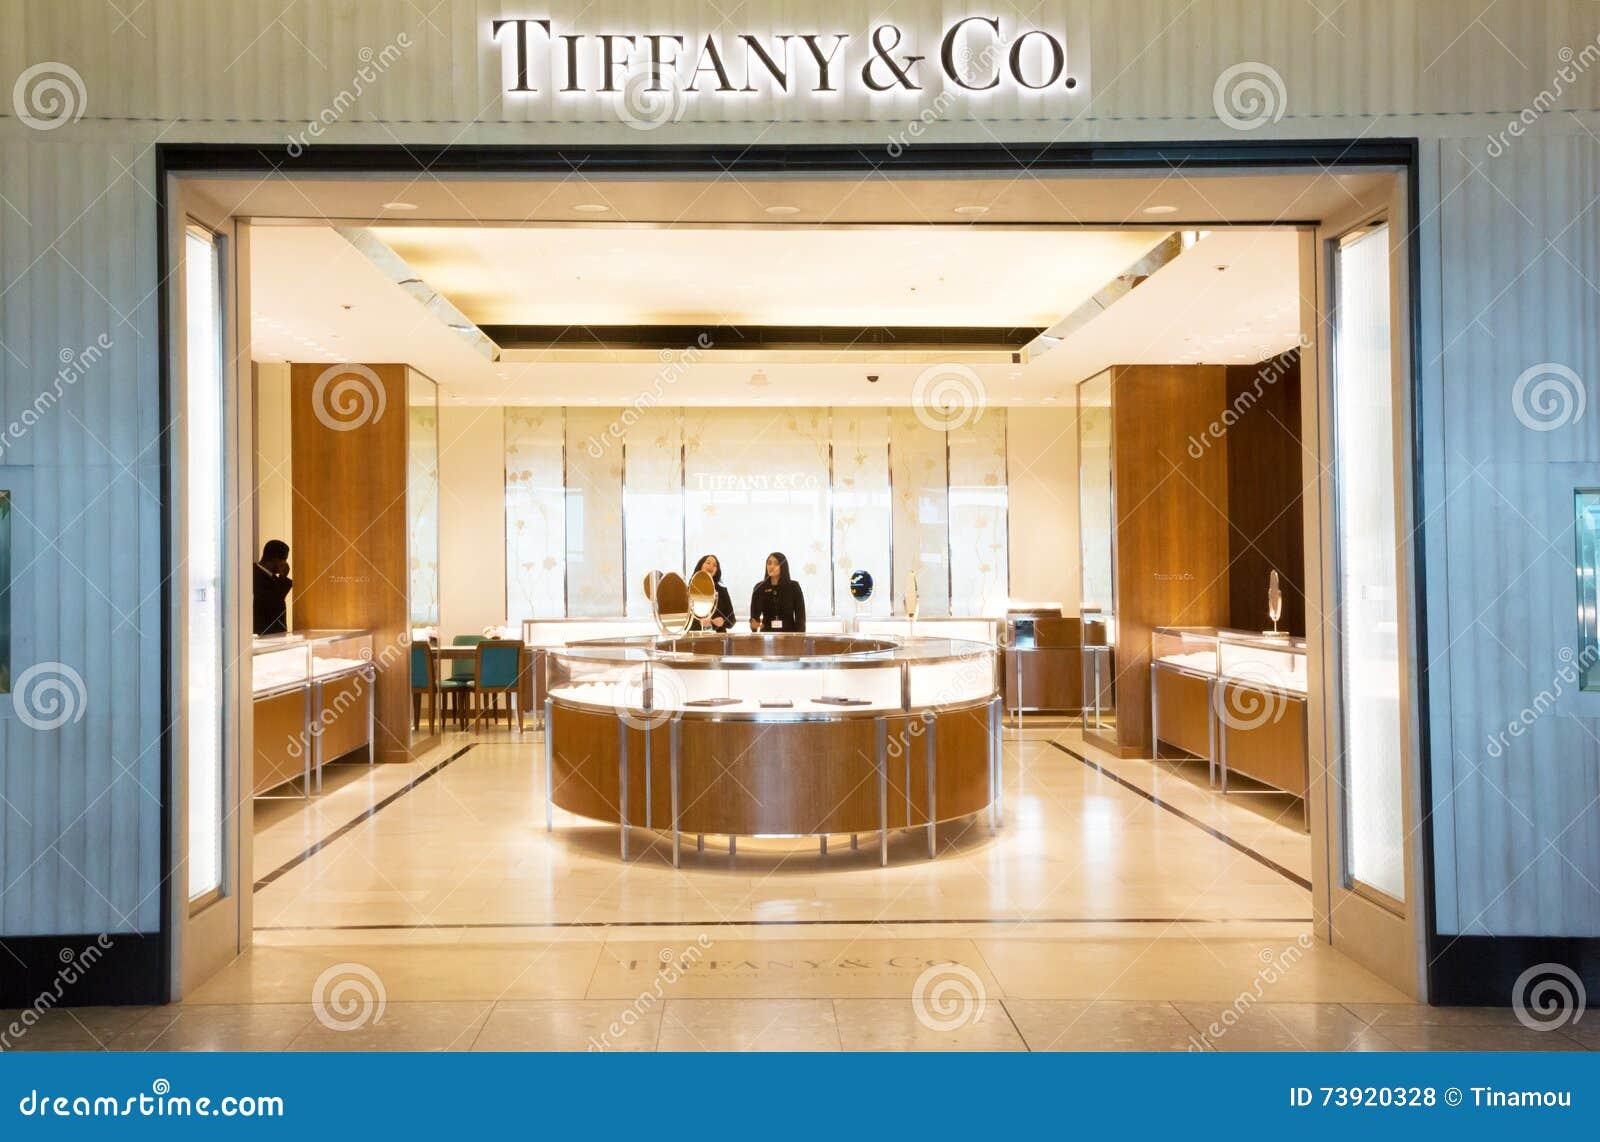 8c8b49430de8 Tiffany   Co. Store In Heathrow Airport